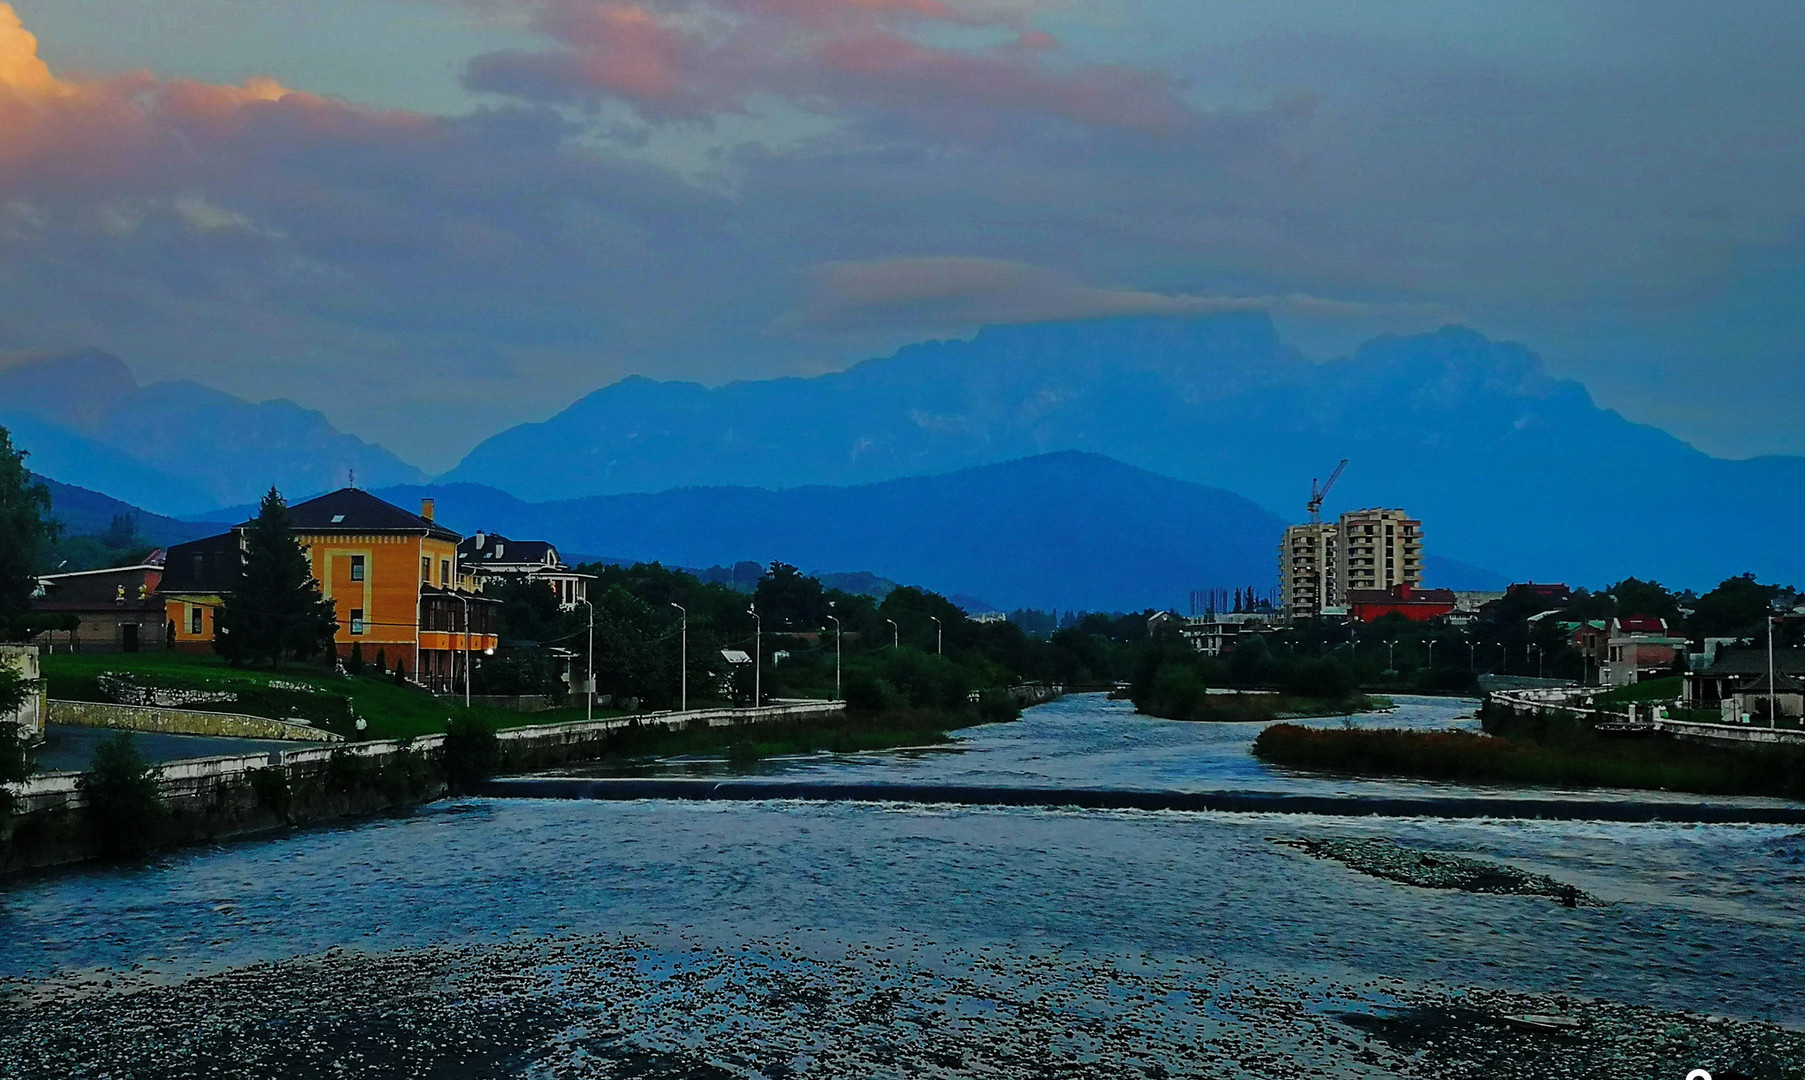 Панорама Кавказских гор с Чугунного моста, Владикавказ